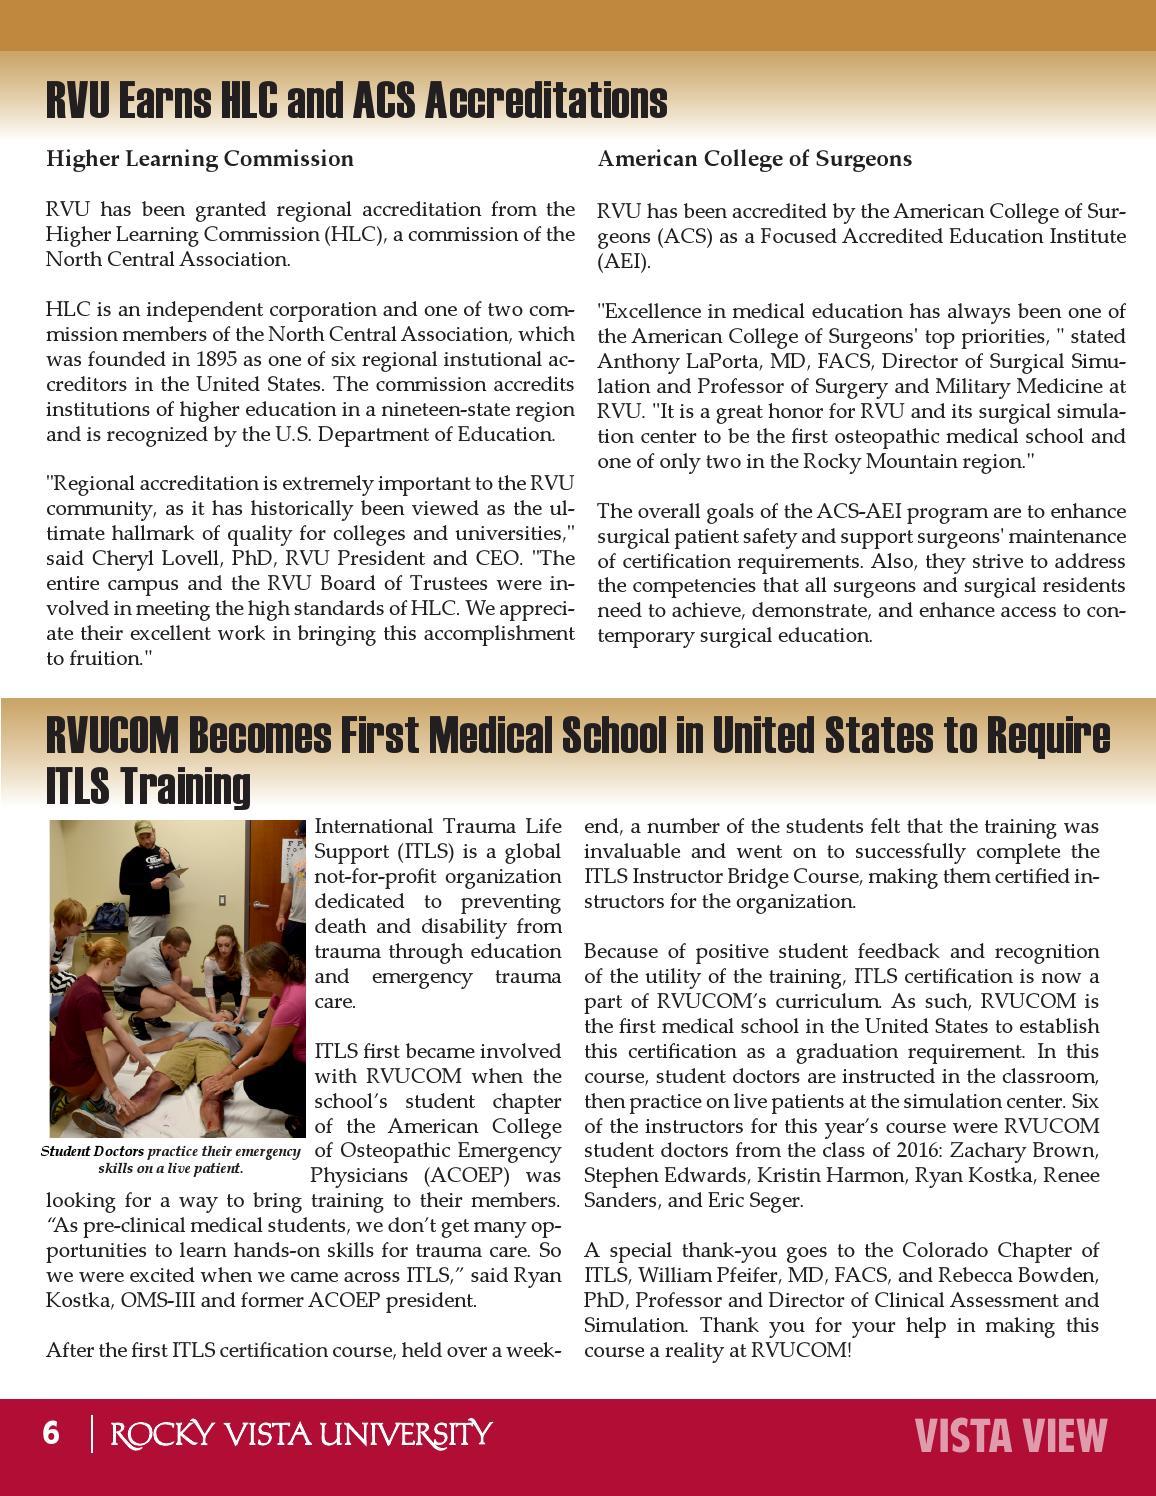 Rvu Vista View Fall 2014 Issue By Rocky Vista University College